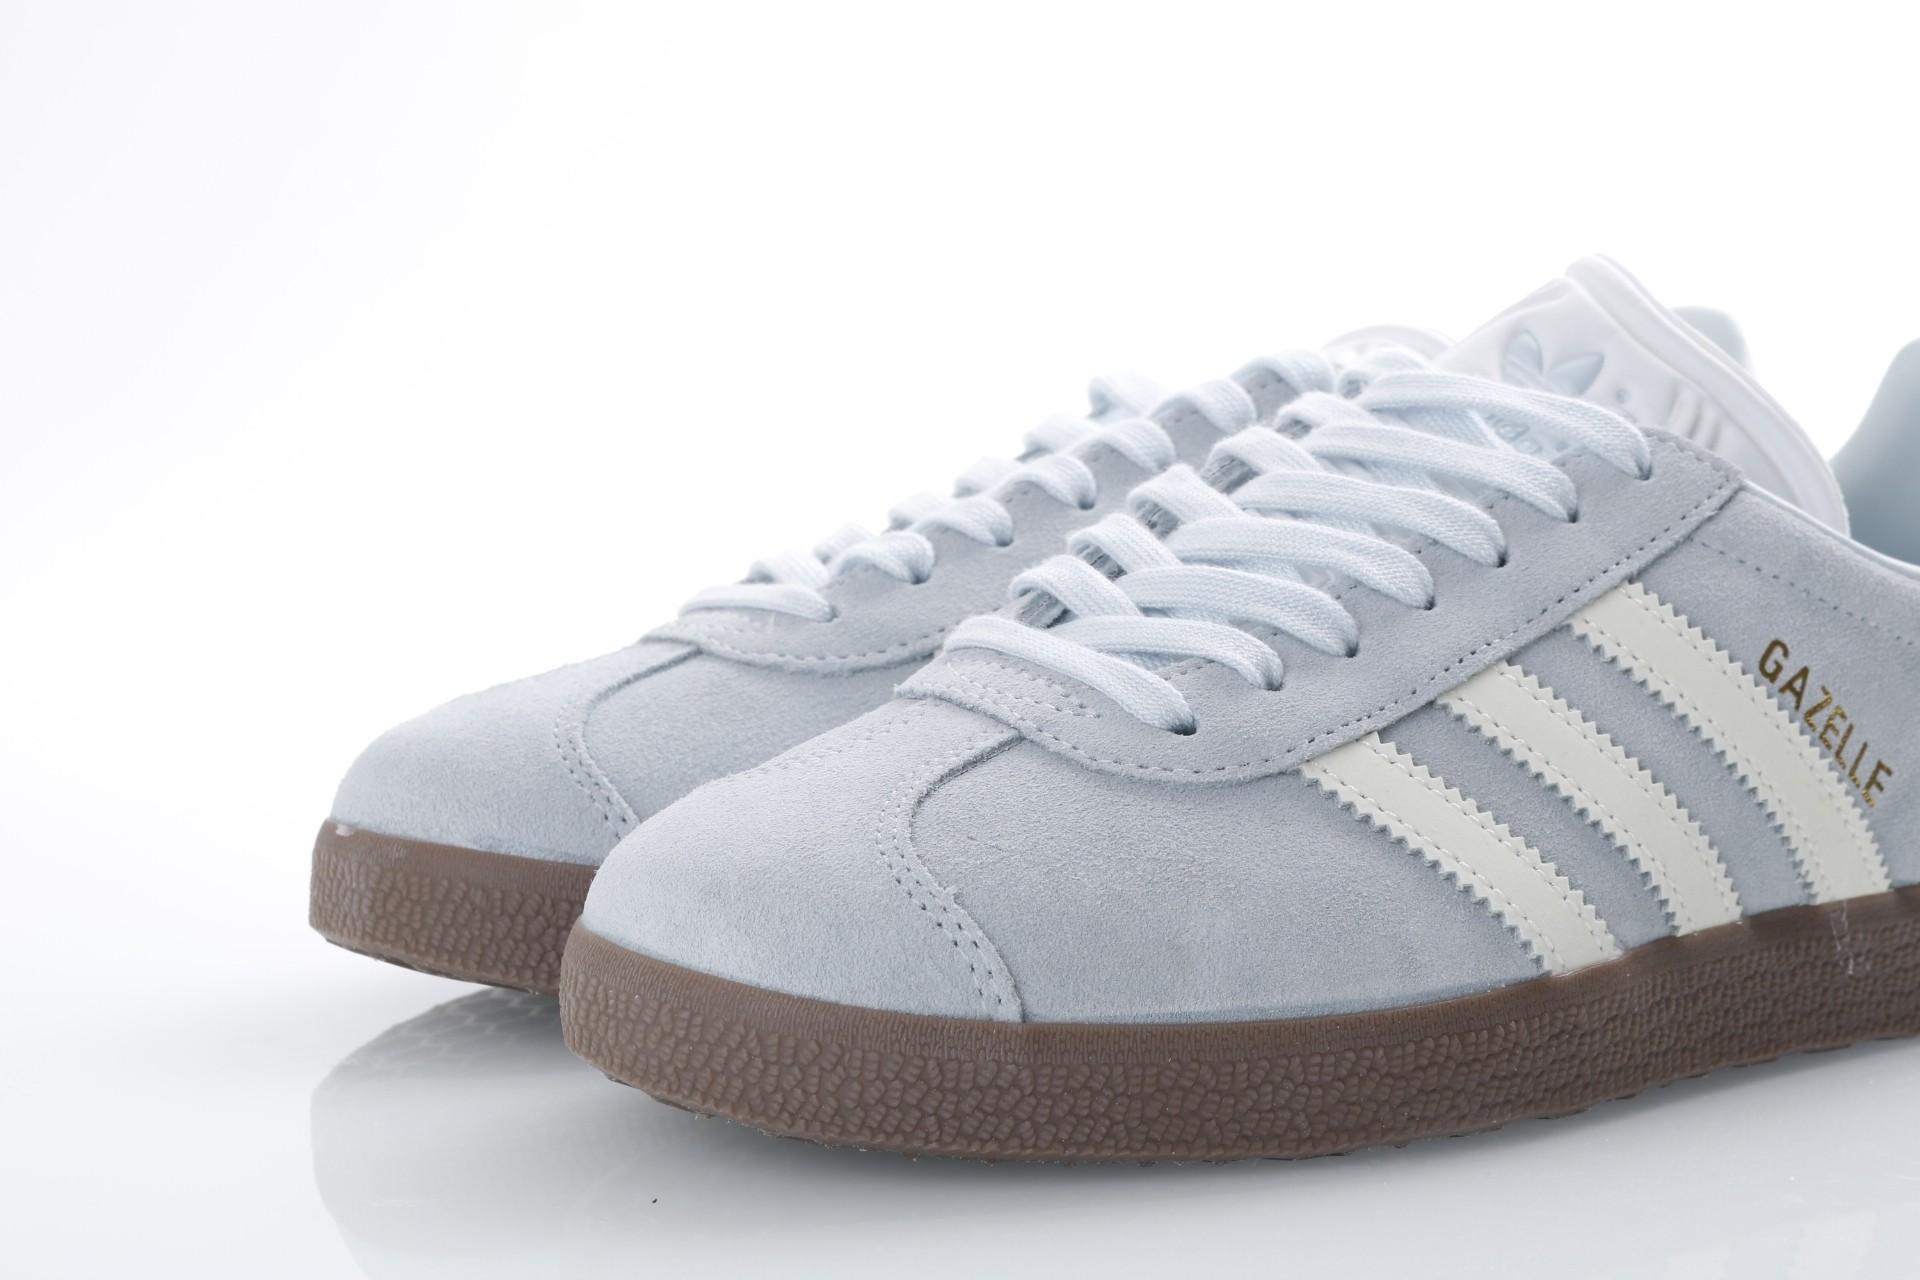 e9e90b9322c Britain Sneakers Blauw Originals nl Adidas Cq2178 Gazelle Go SUzqMVp